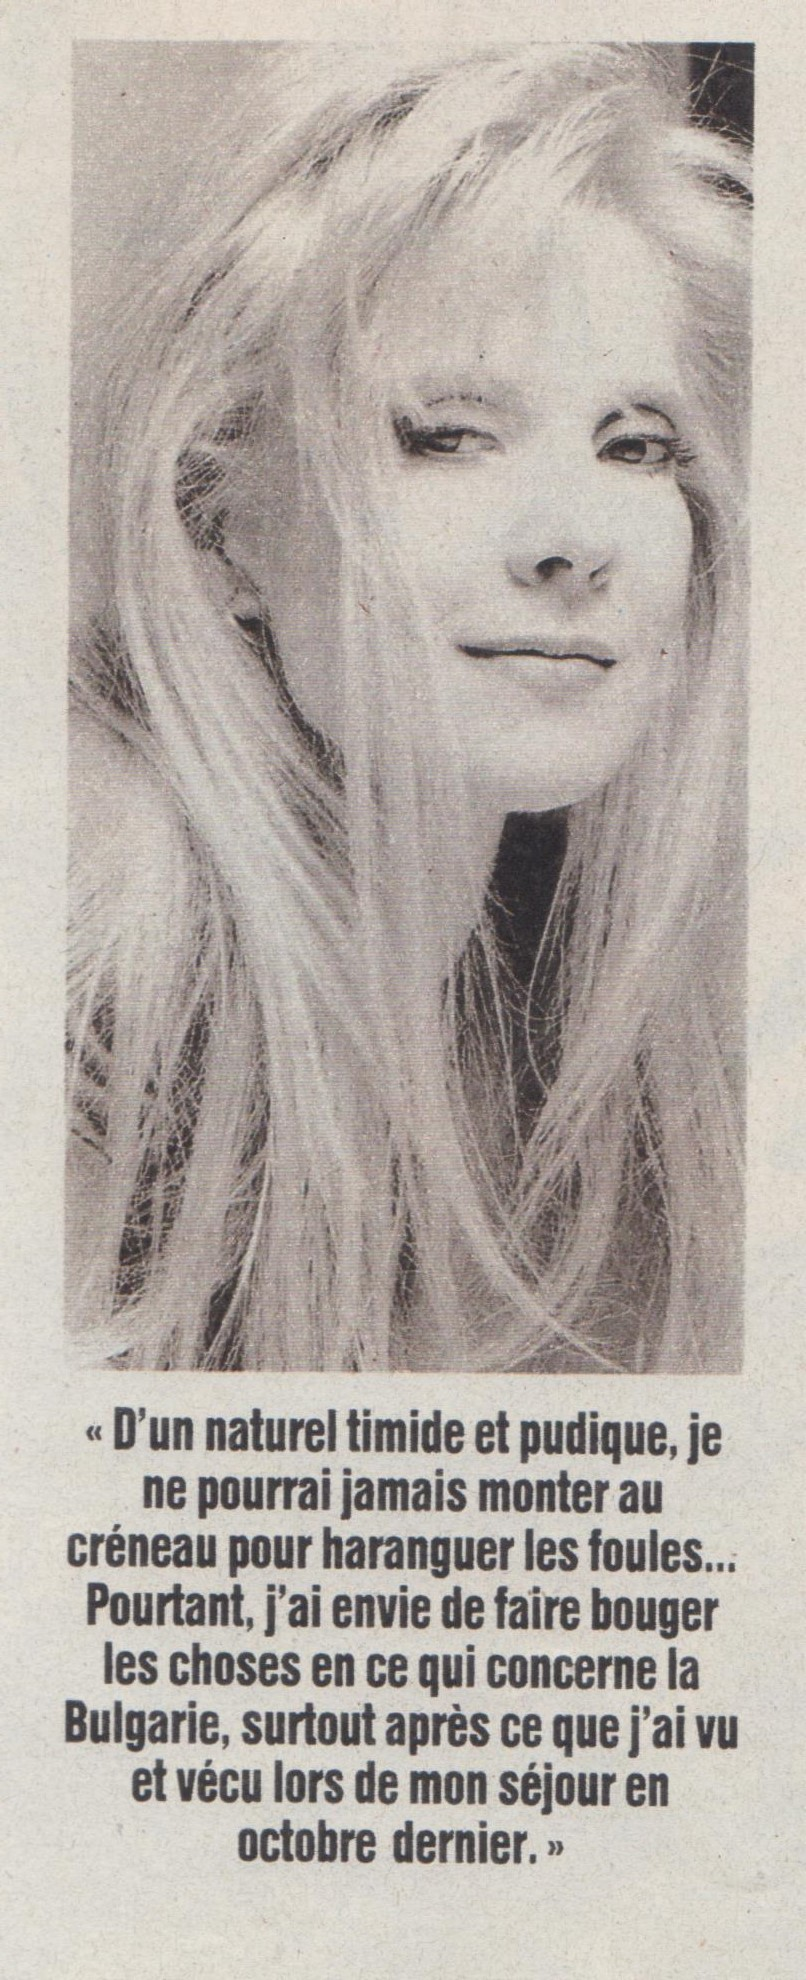 Max février 1991 211